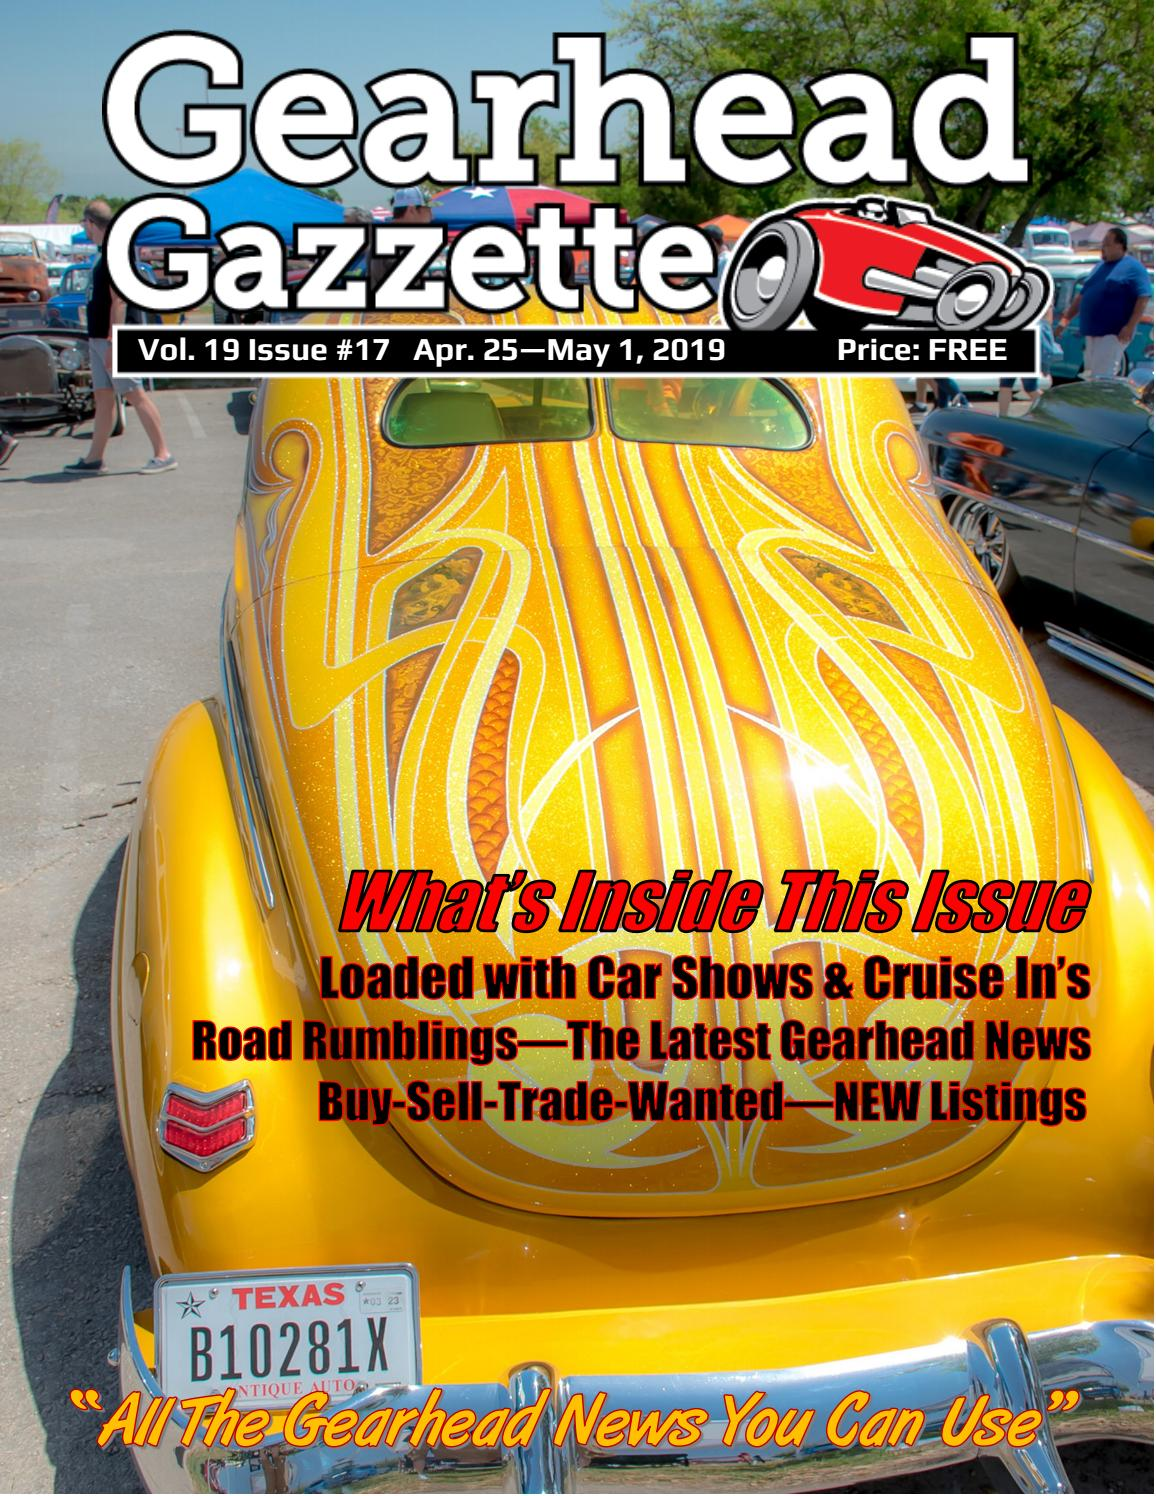 Gearhead Gazzette Vol  19 Issue #17 Apr 25-May 1 2019 by